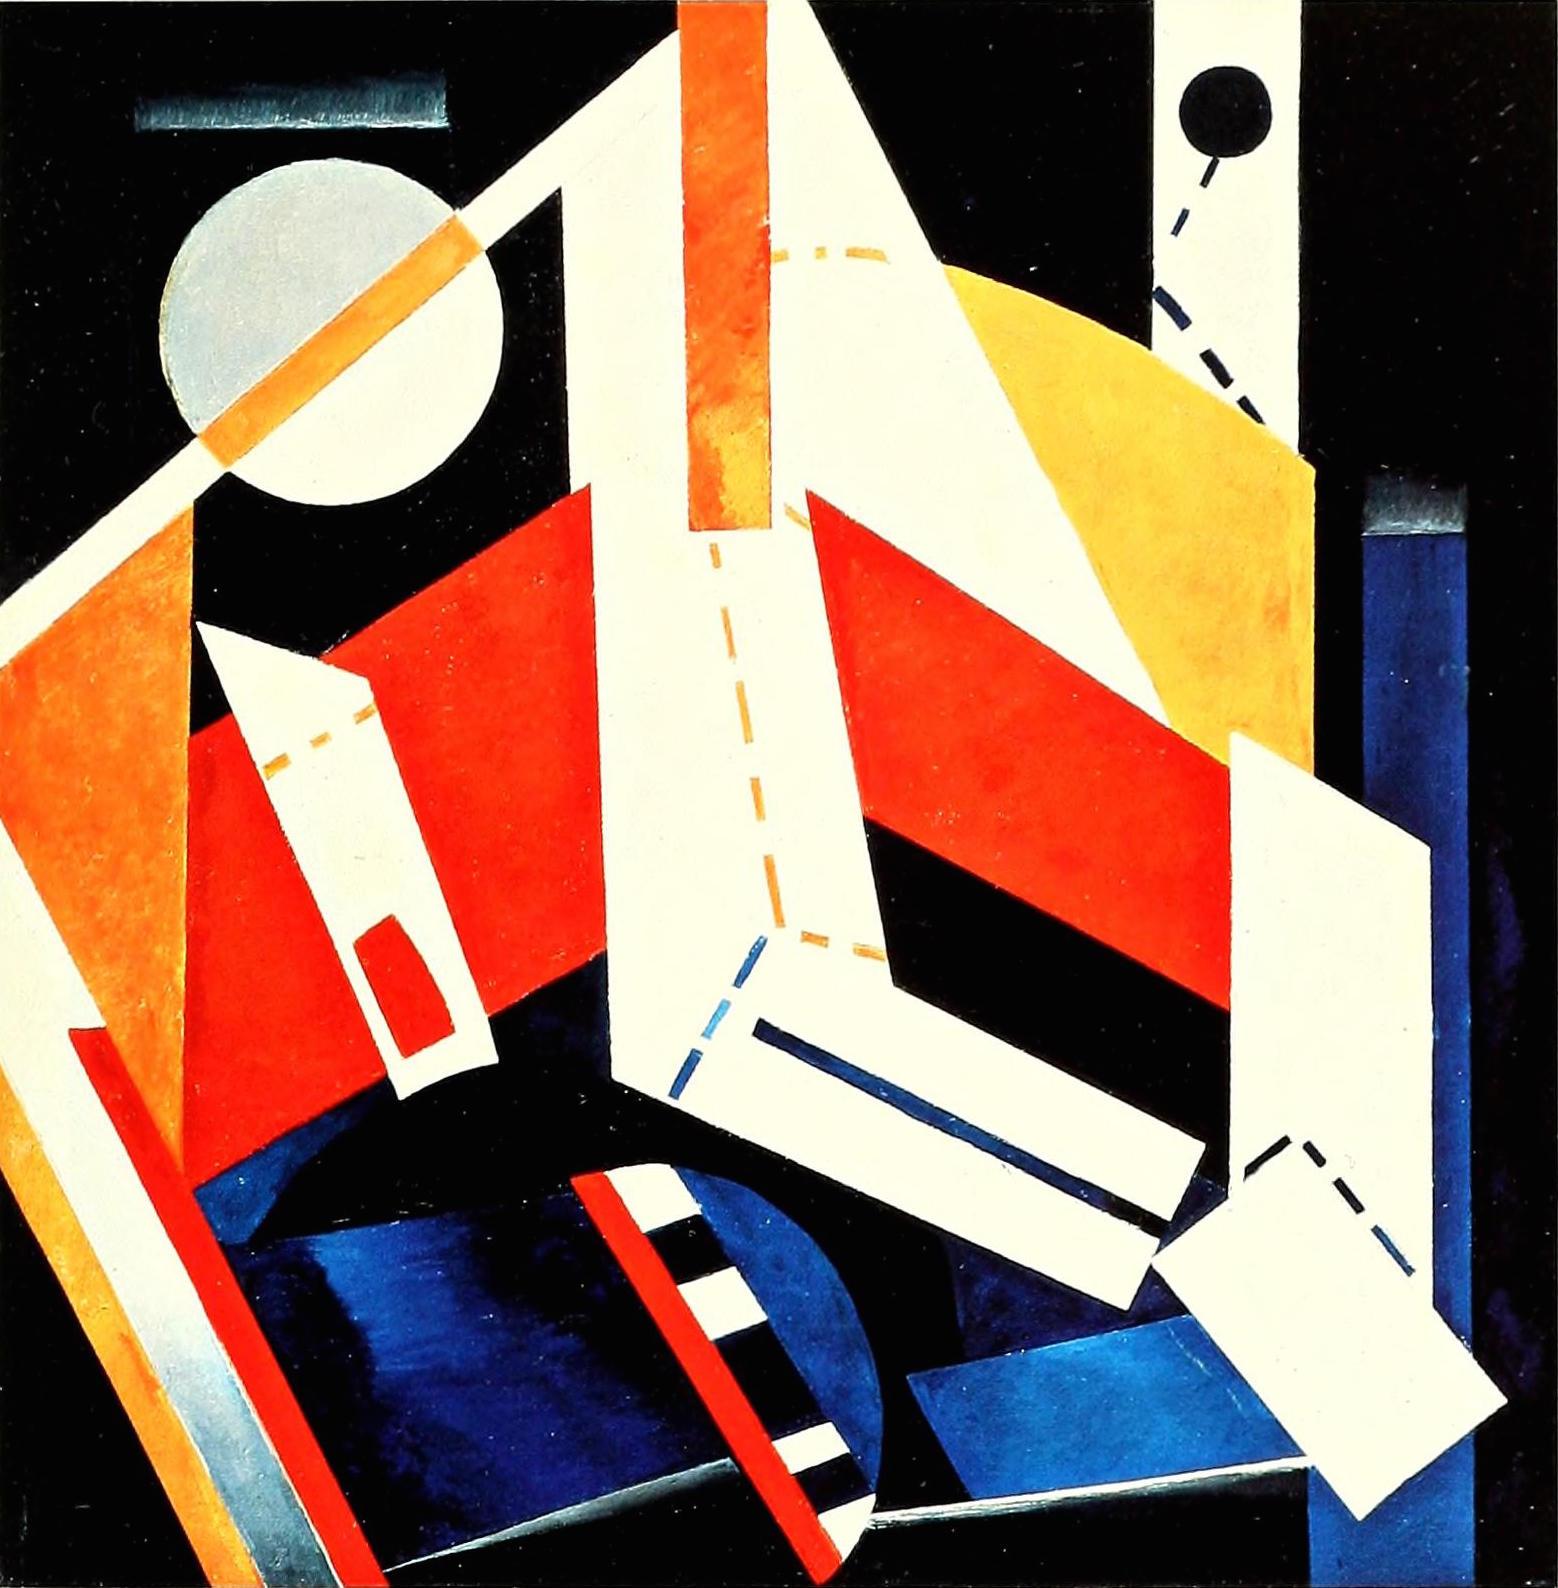 Aleksandra Ekster, Construction, 1922-23 Oil on canvas, 89.8 x 89.2 cm